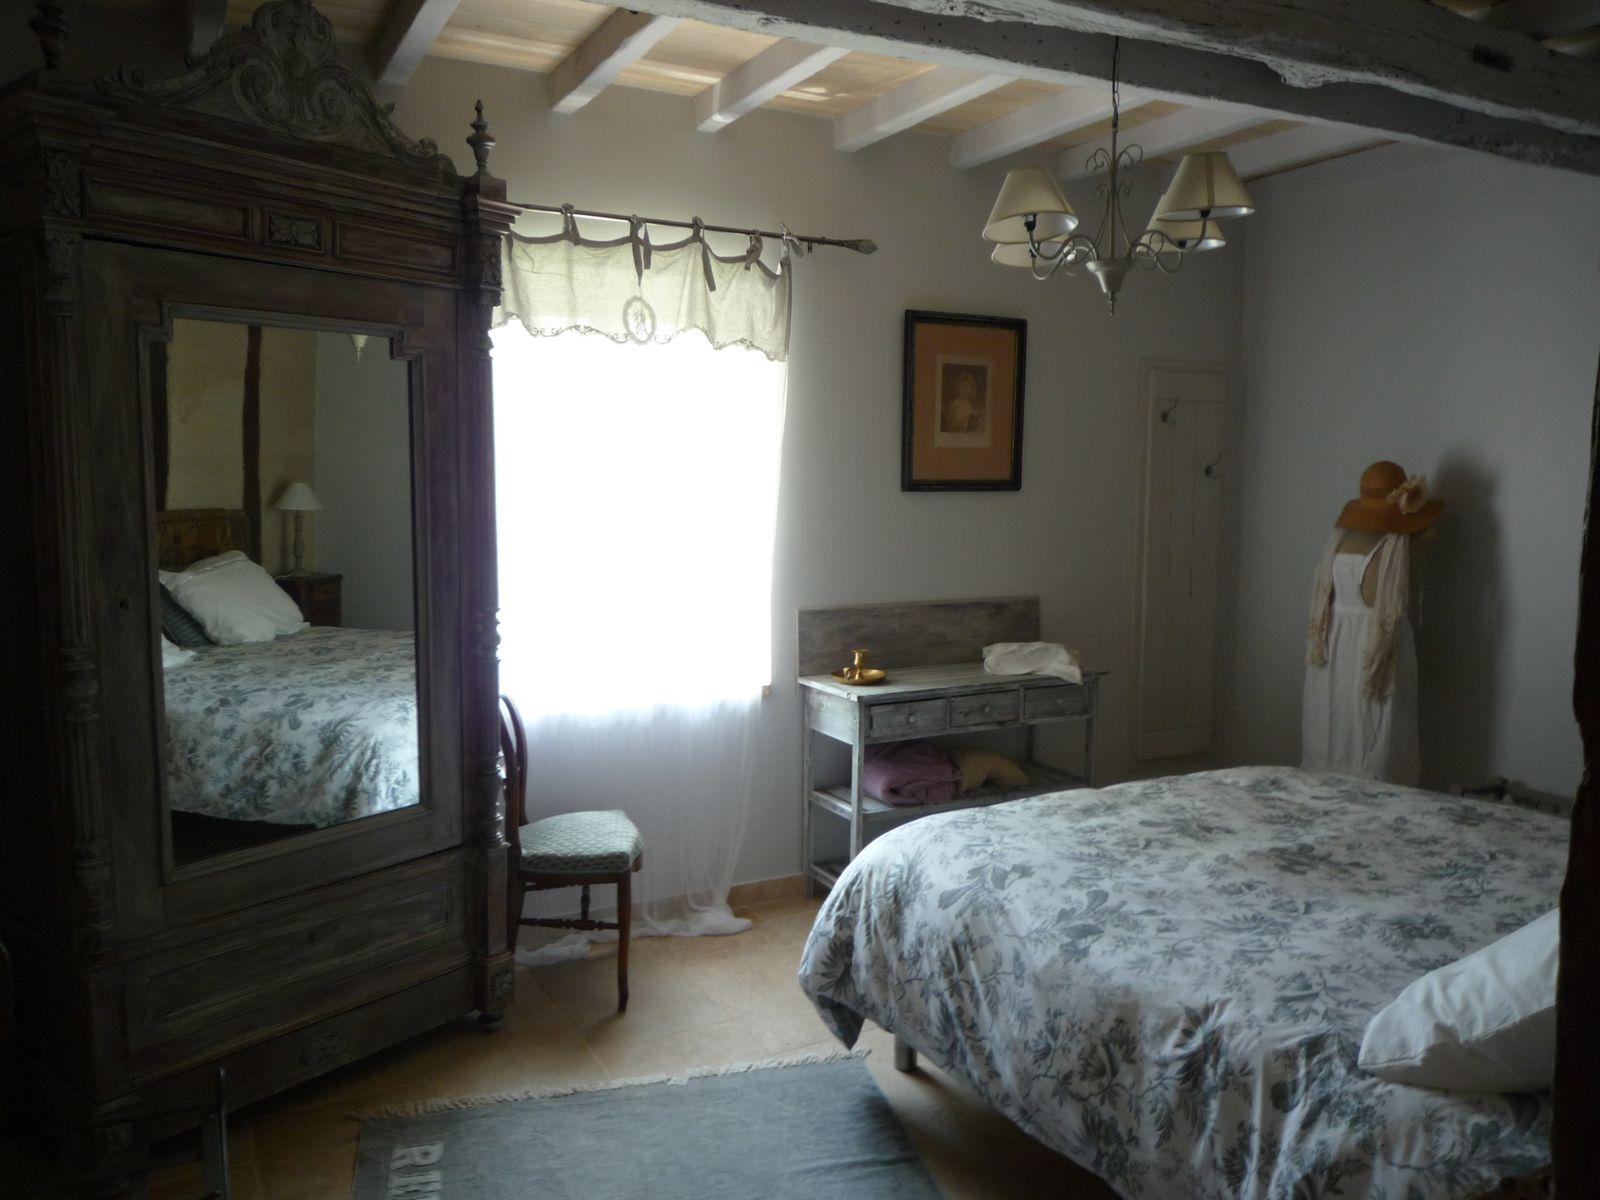 Chambre avec petite armoire